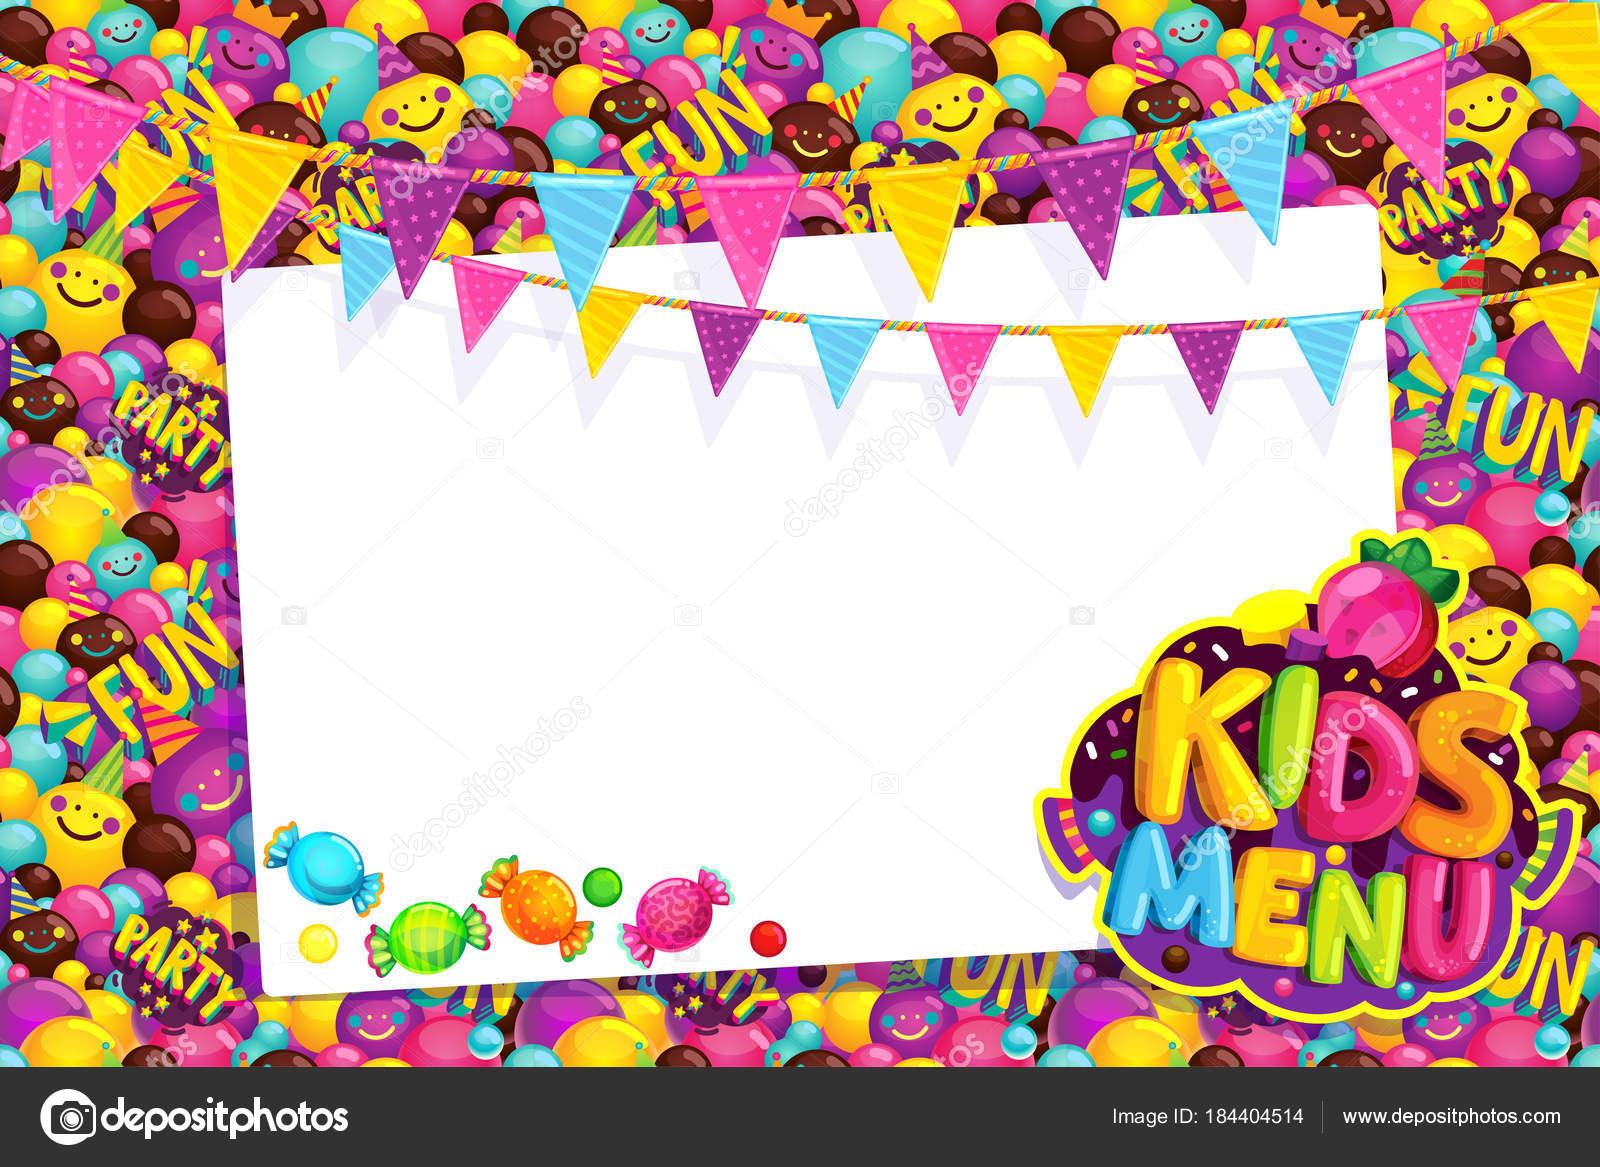 Kids Menu Card Frame Vector Illustration Happy Birthday Party